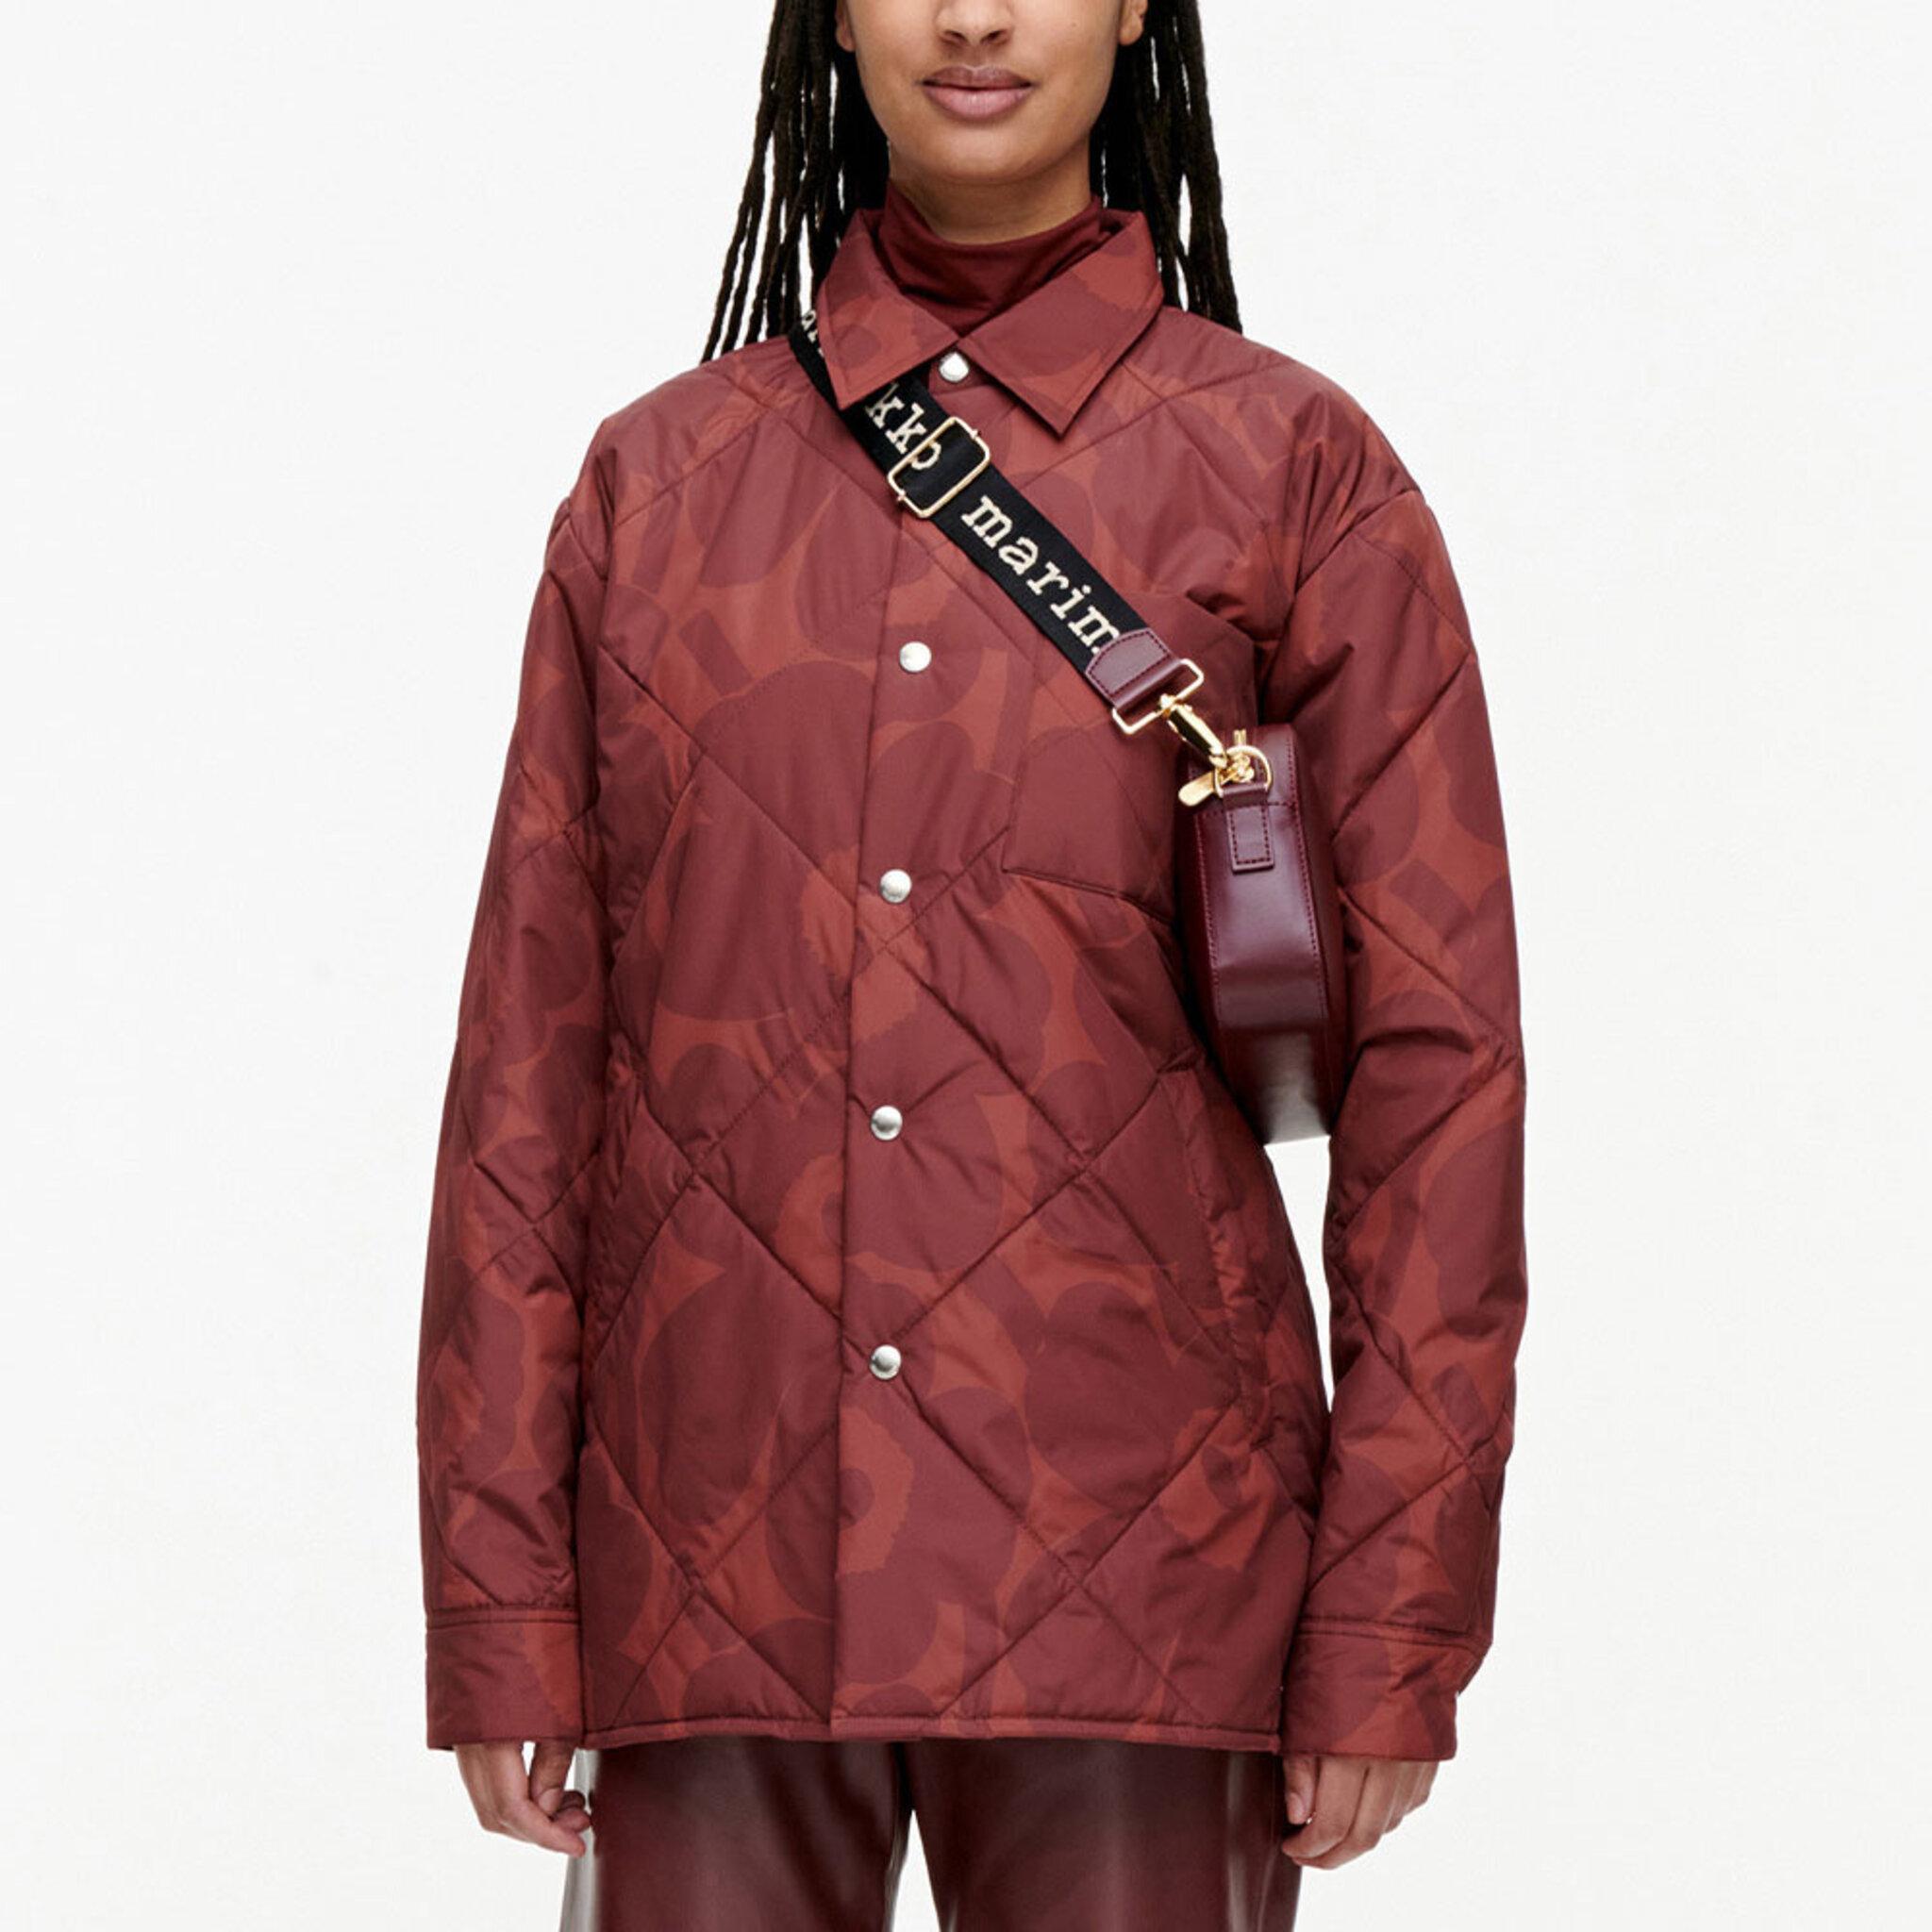 Suuntima Pieni Unikko 2 Jacket